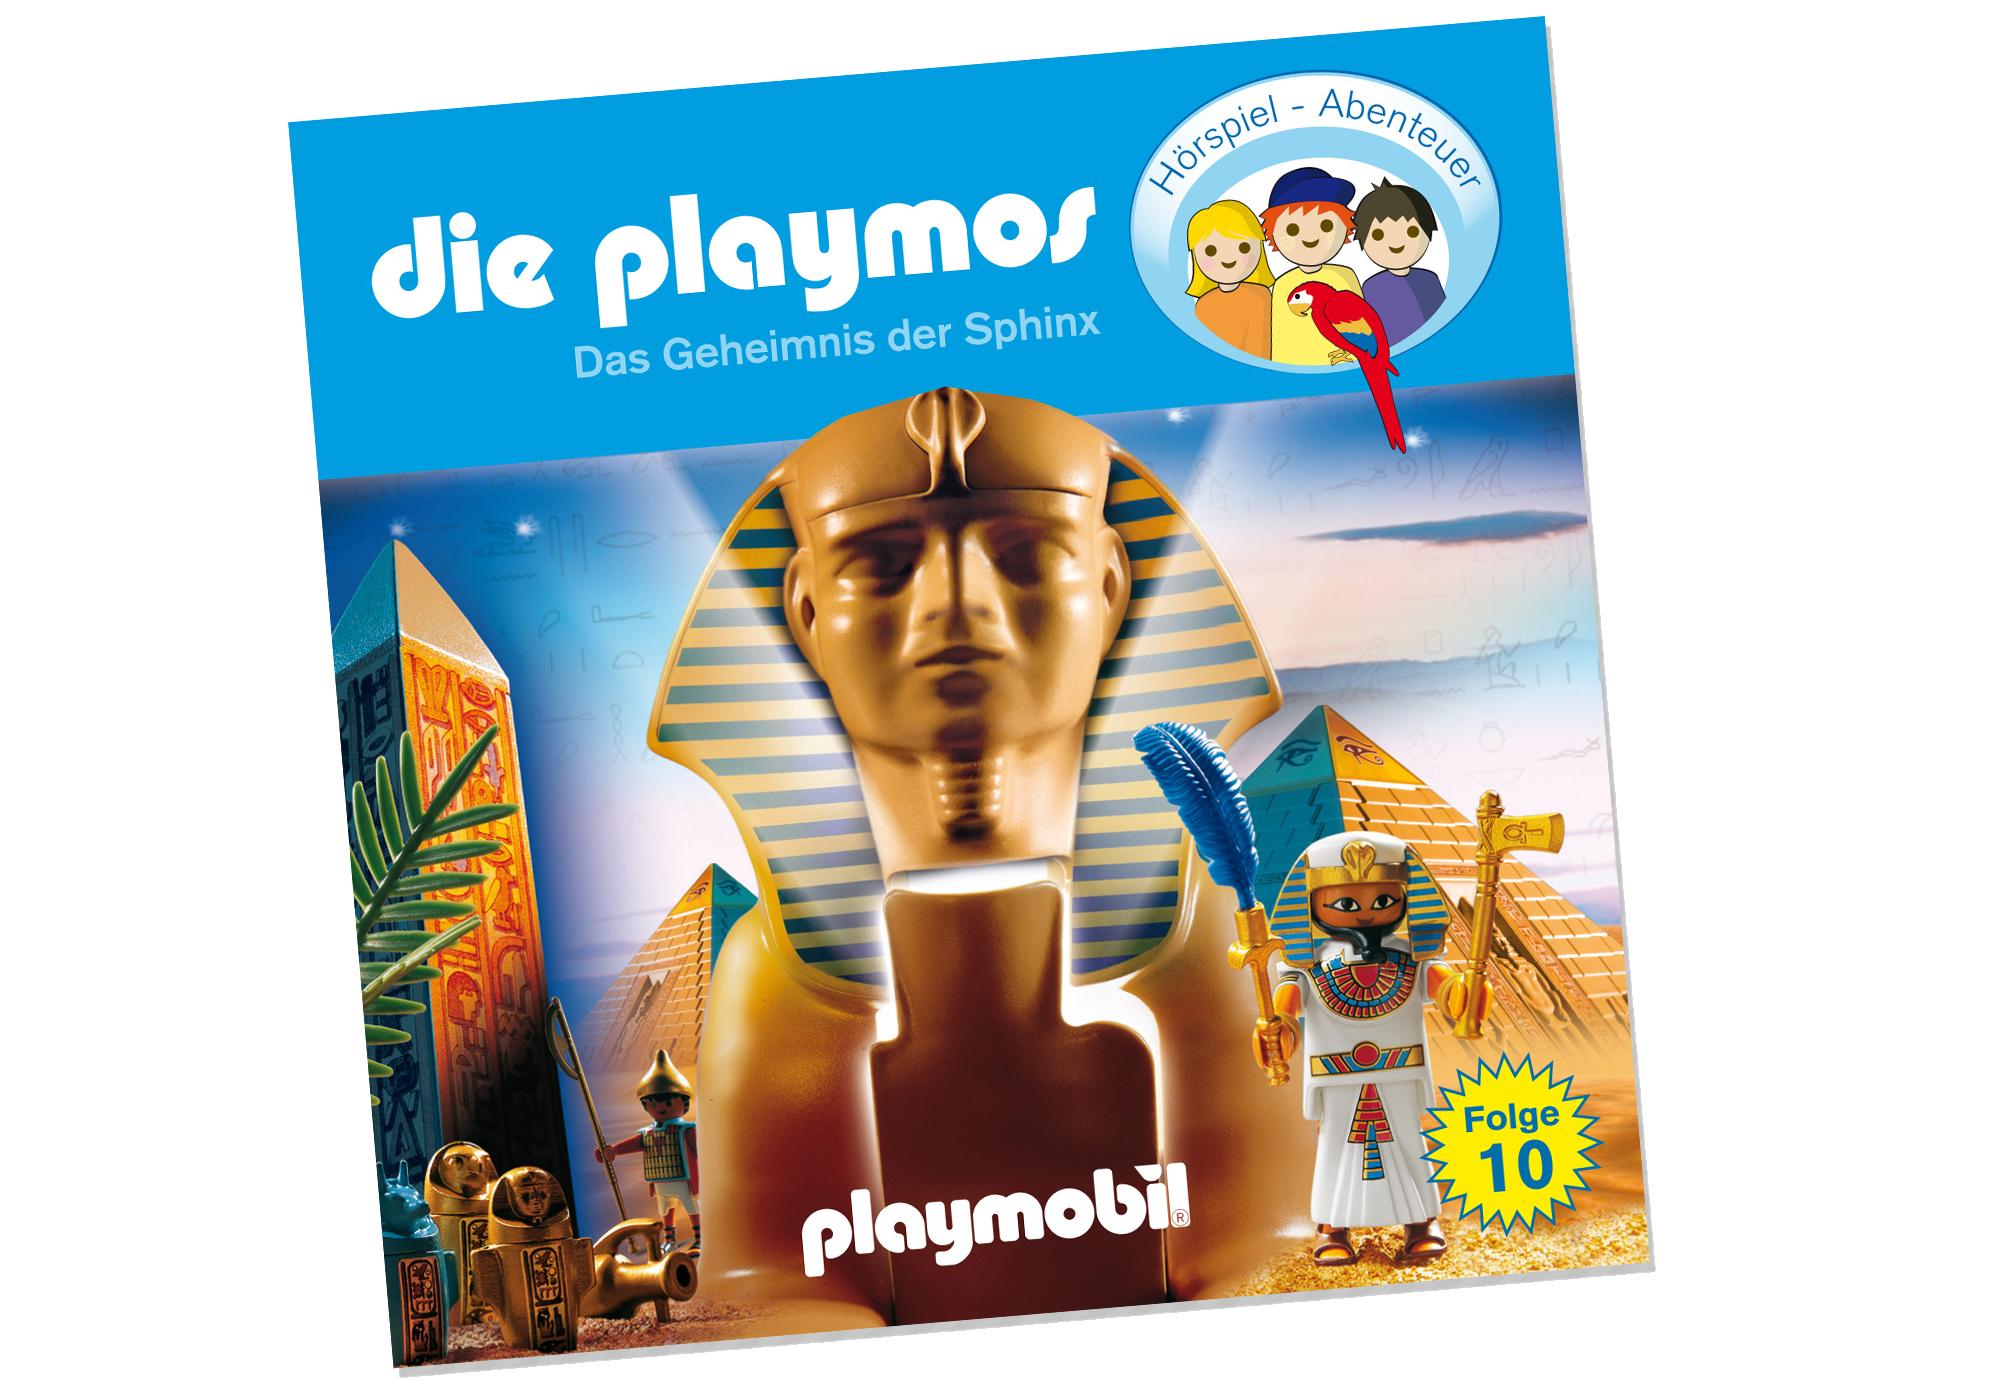 http://media.playmobil.com/i/playmobil/80188_product_detail